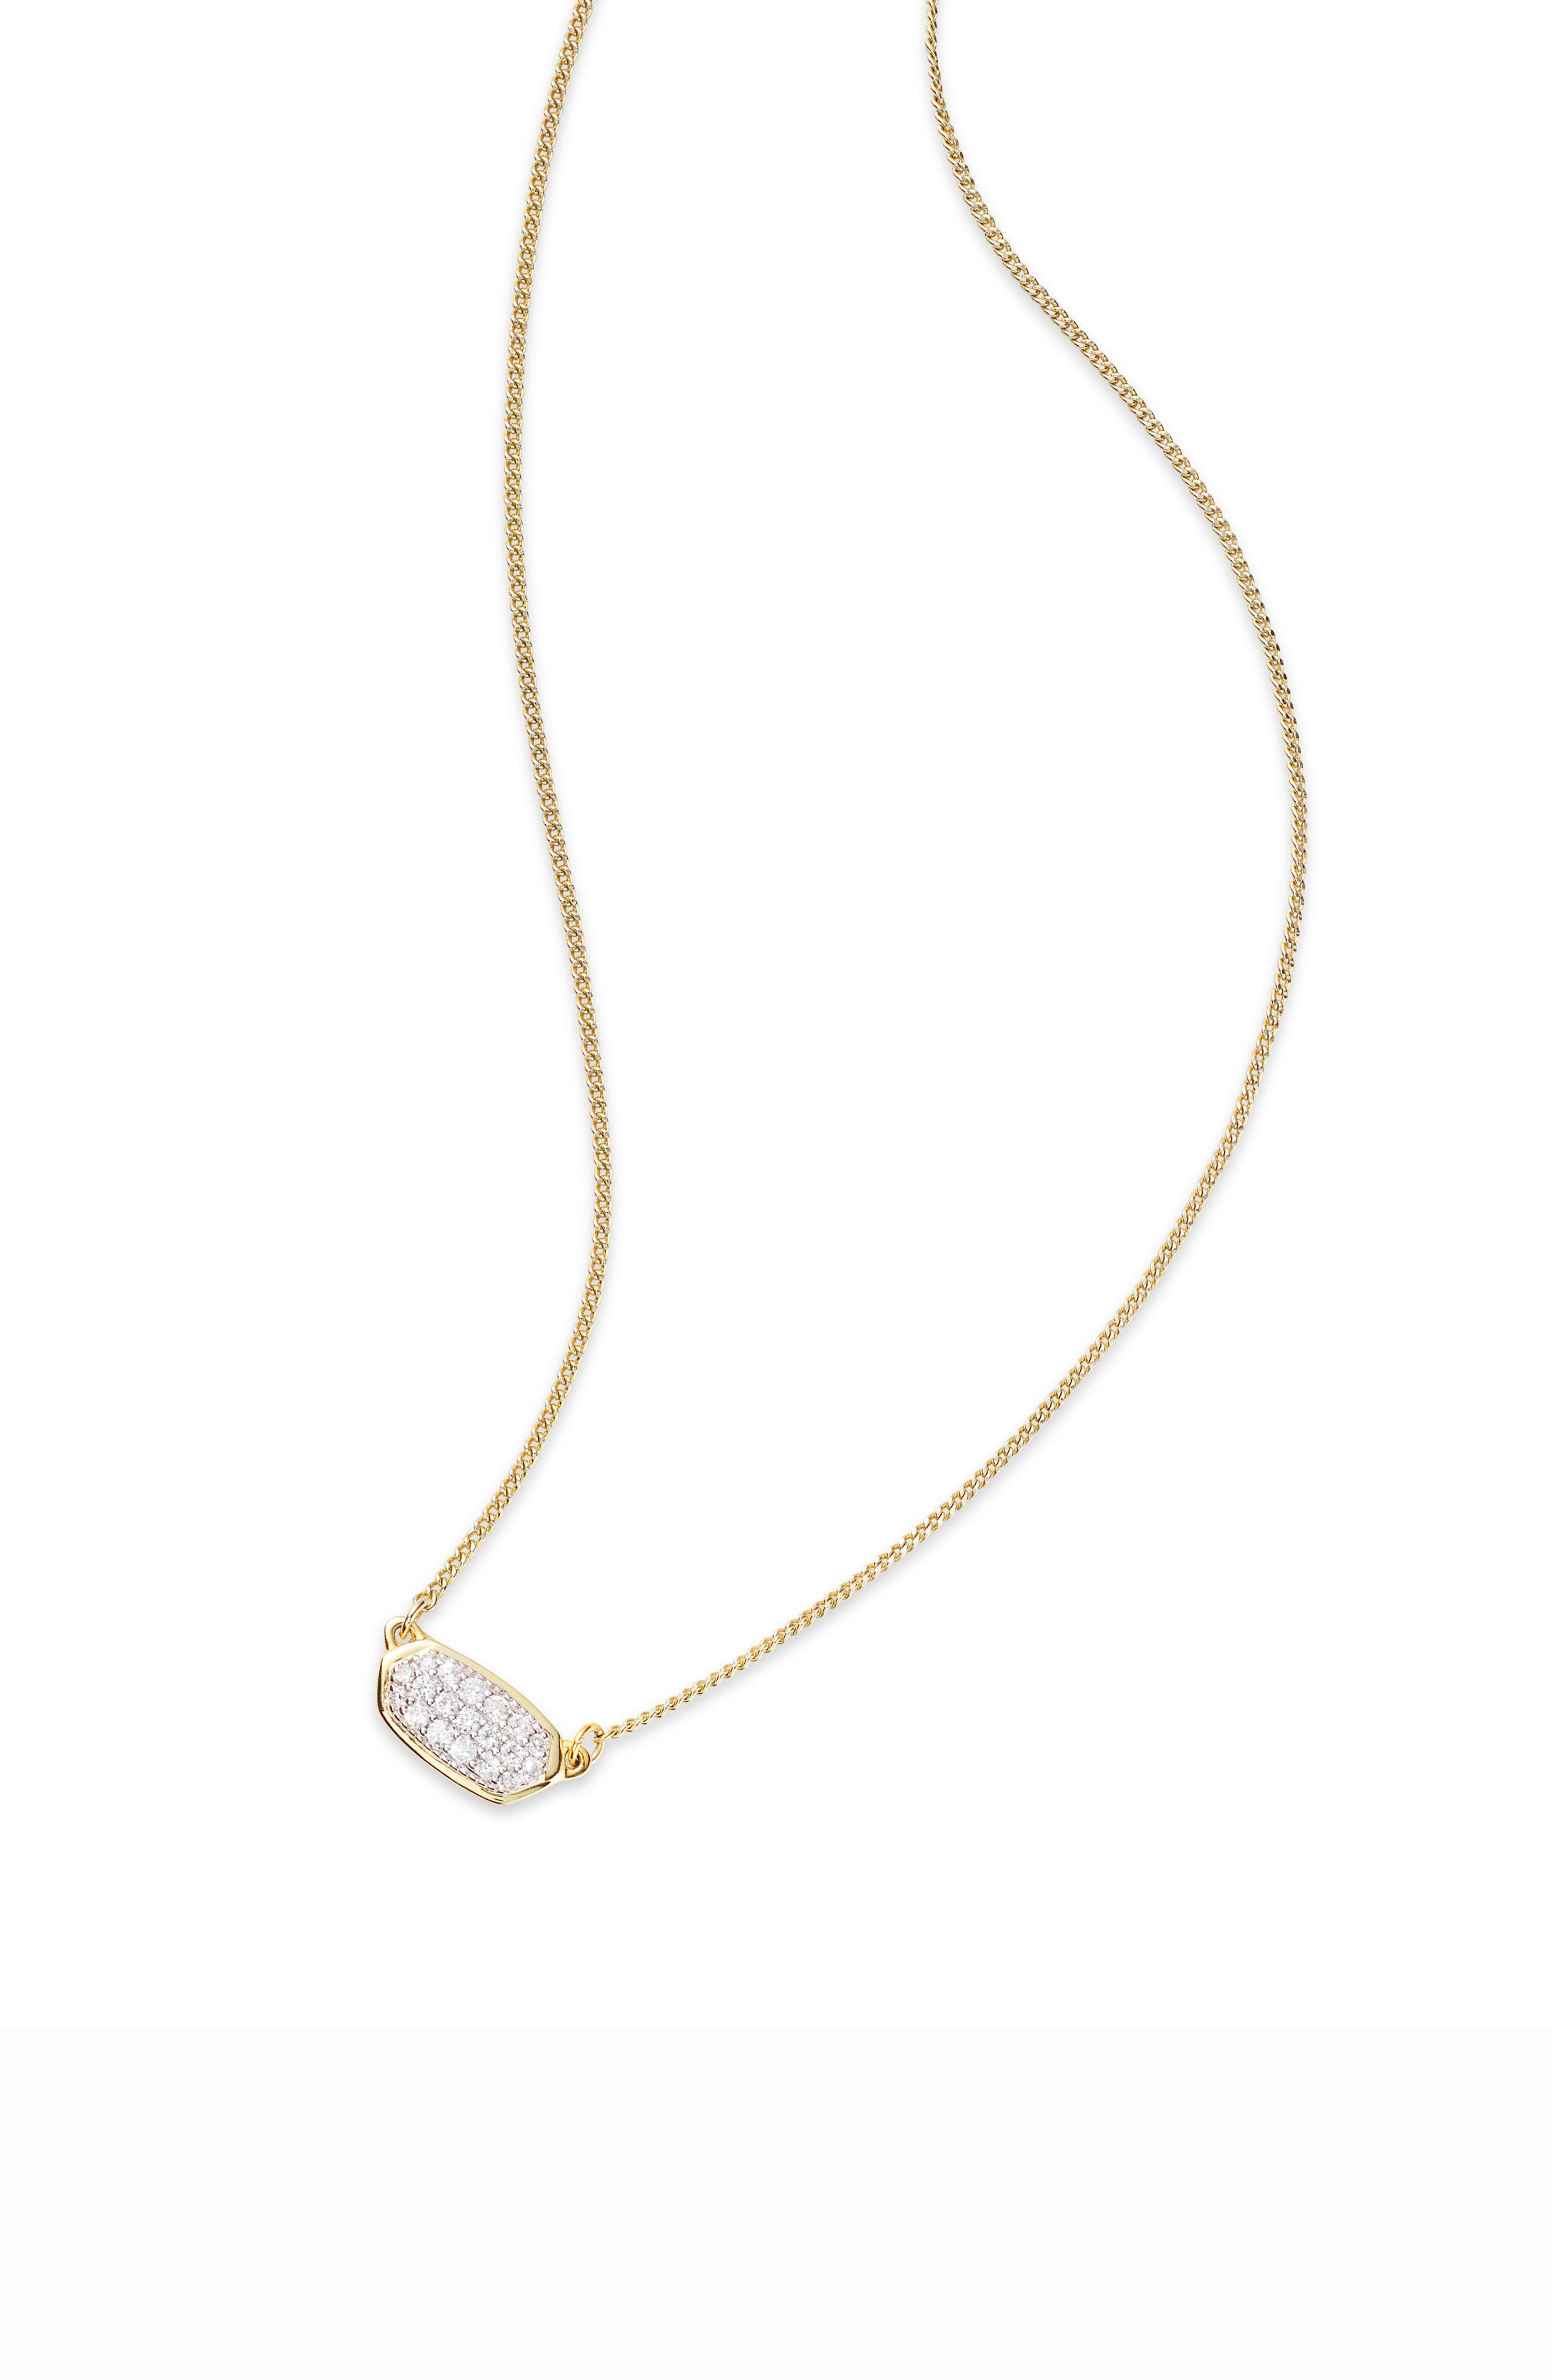 KENDRA SCOTT Lisa Diamond & Gold Pendant Necklace, Main, color, 14K GOLD WHITE DIAMOND